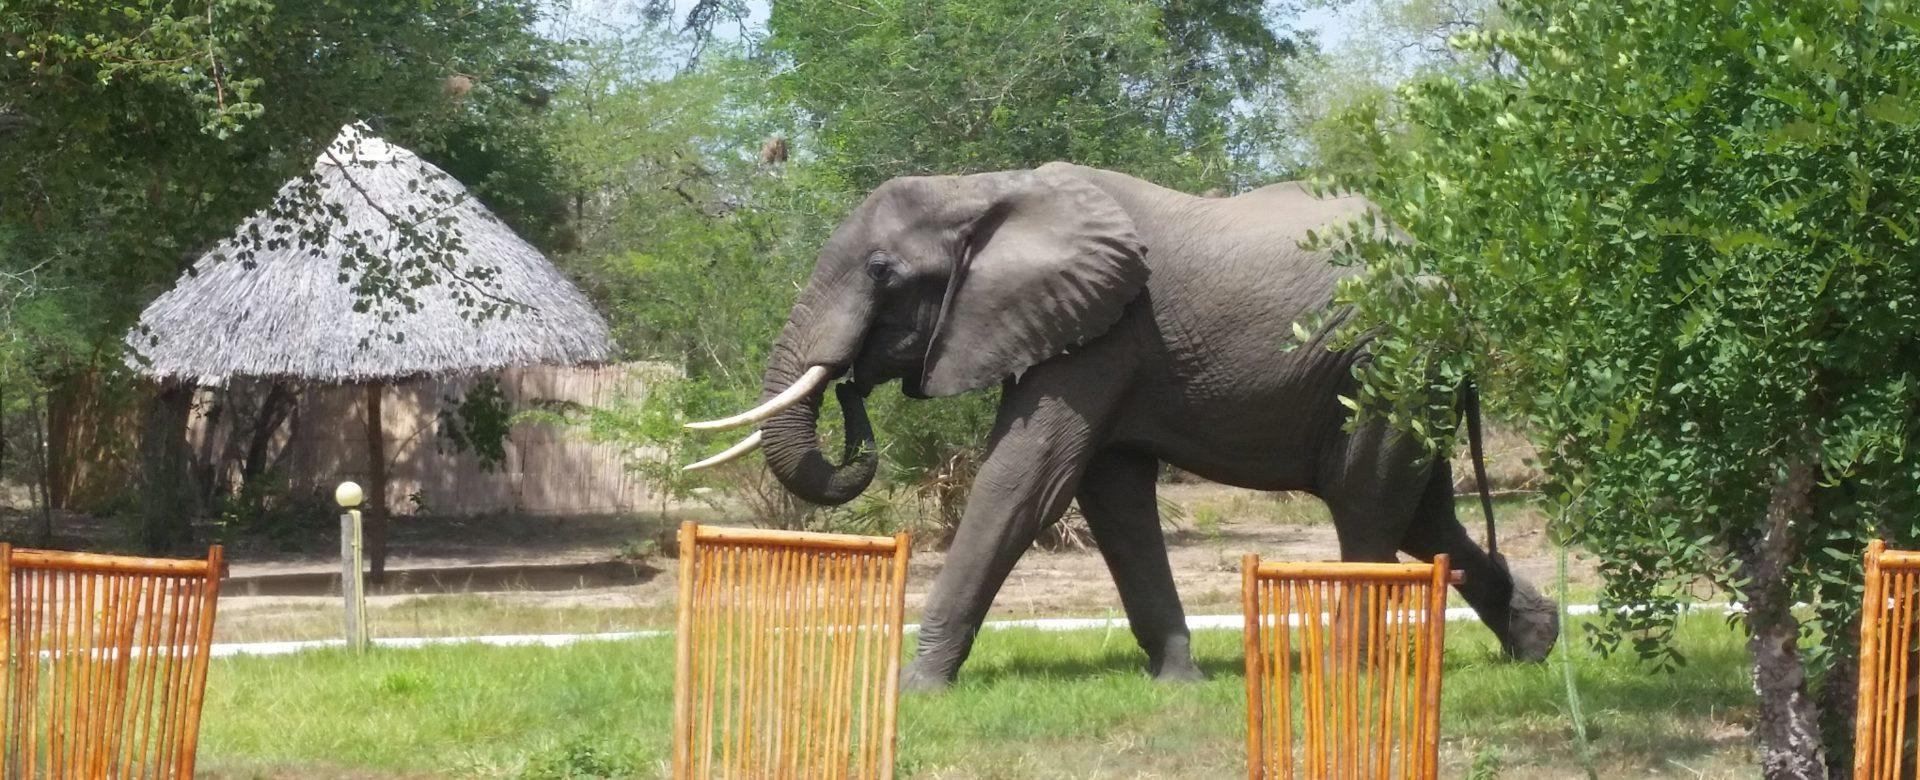 Elephant Selous Game Reserve